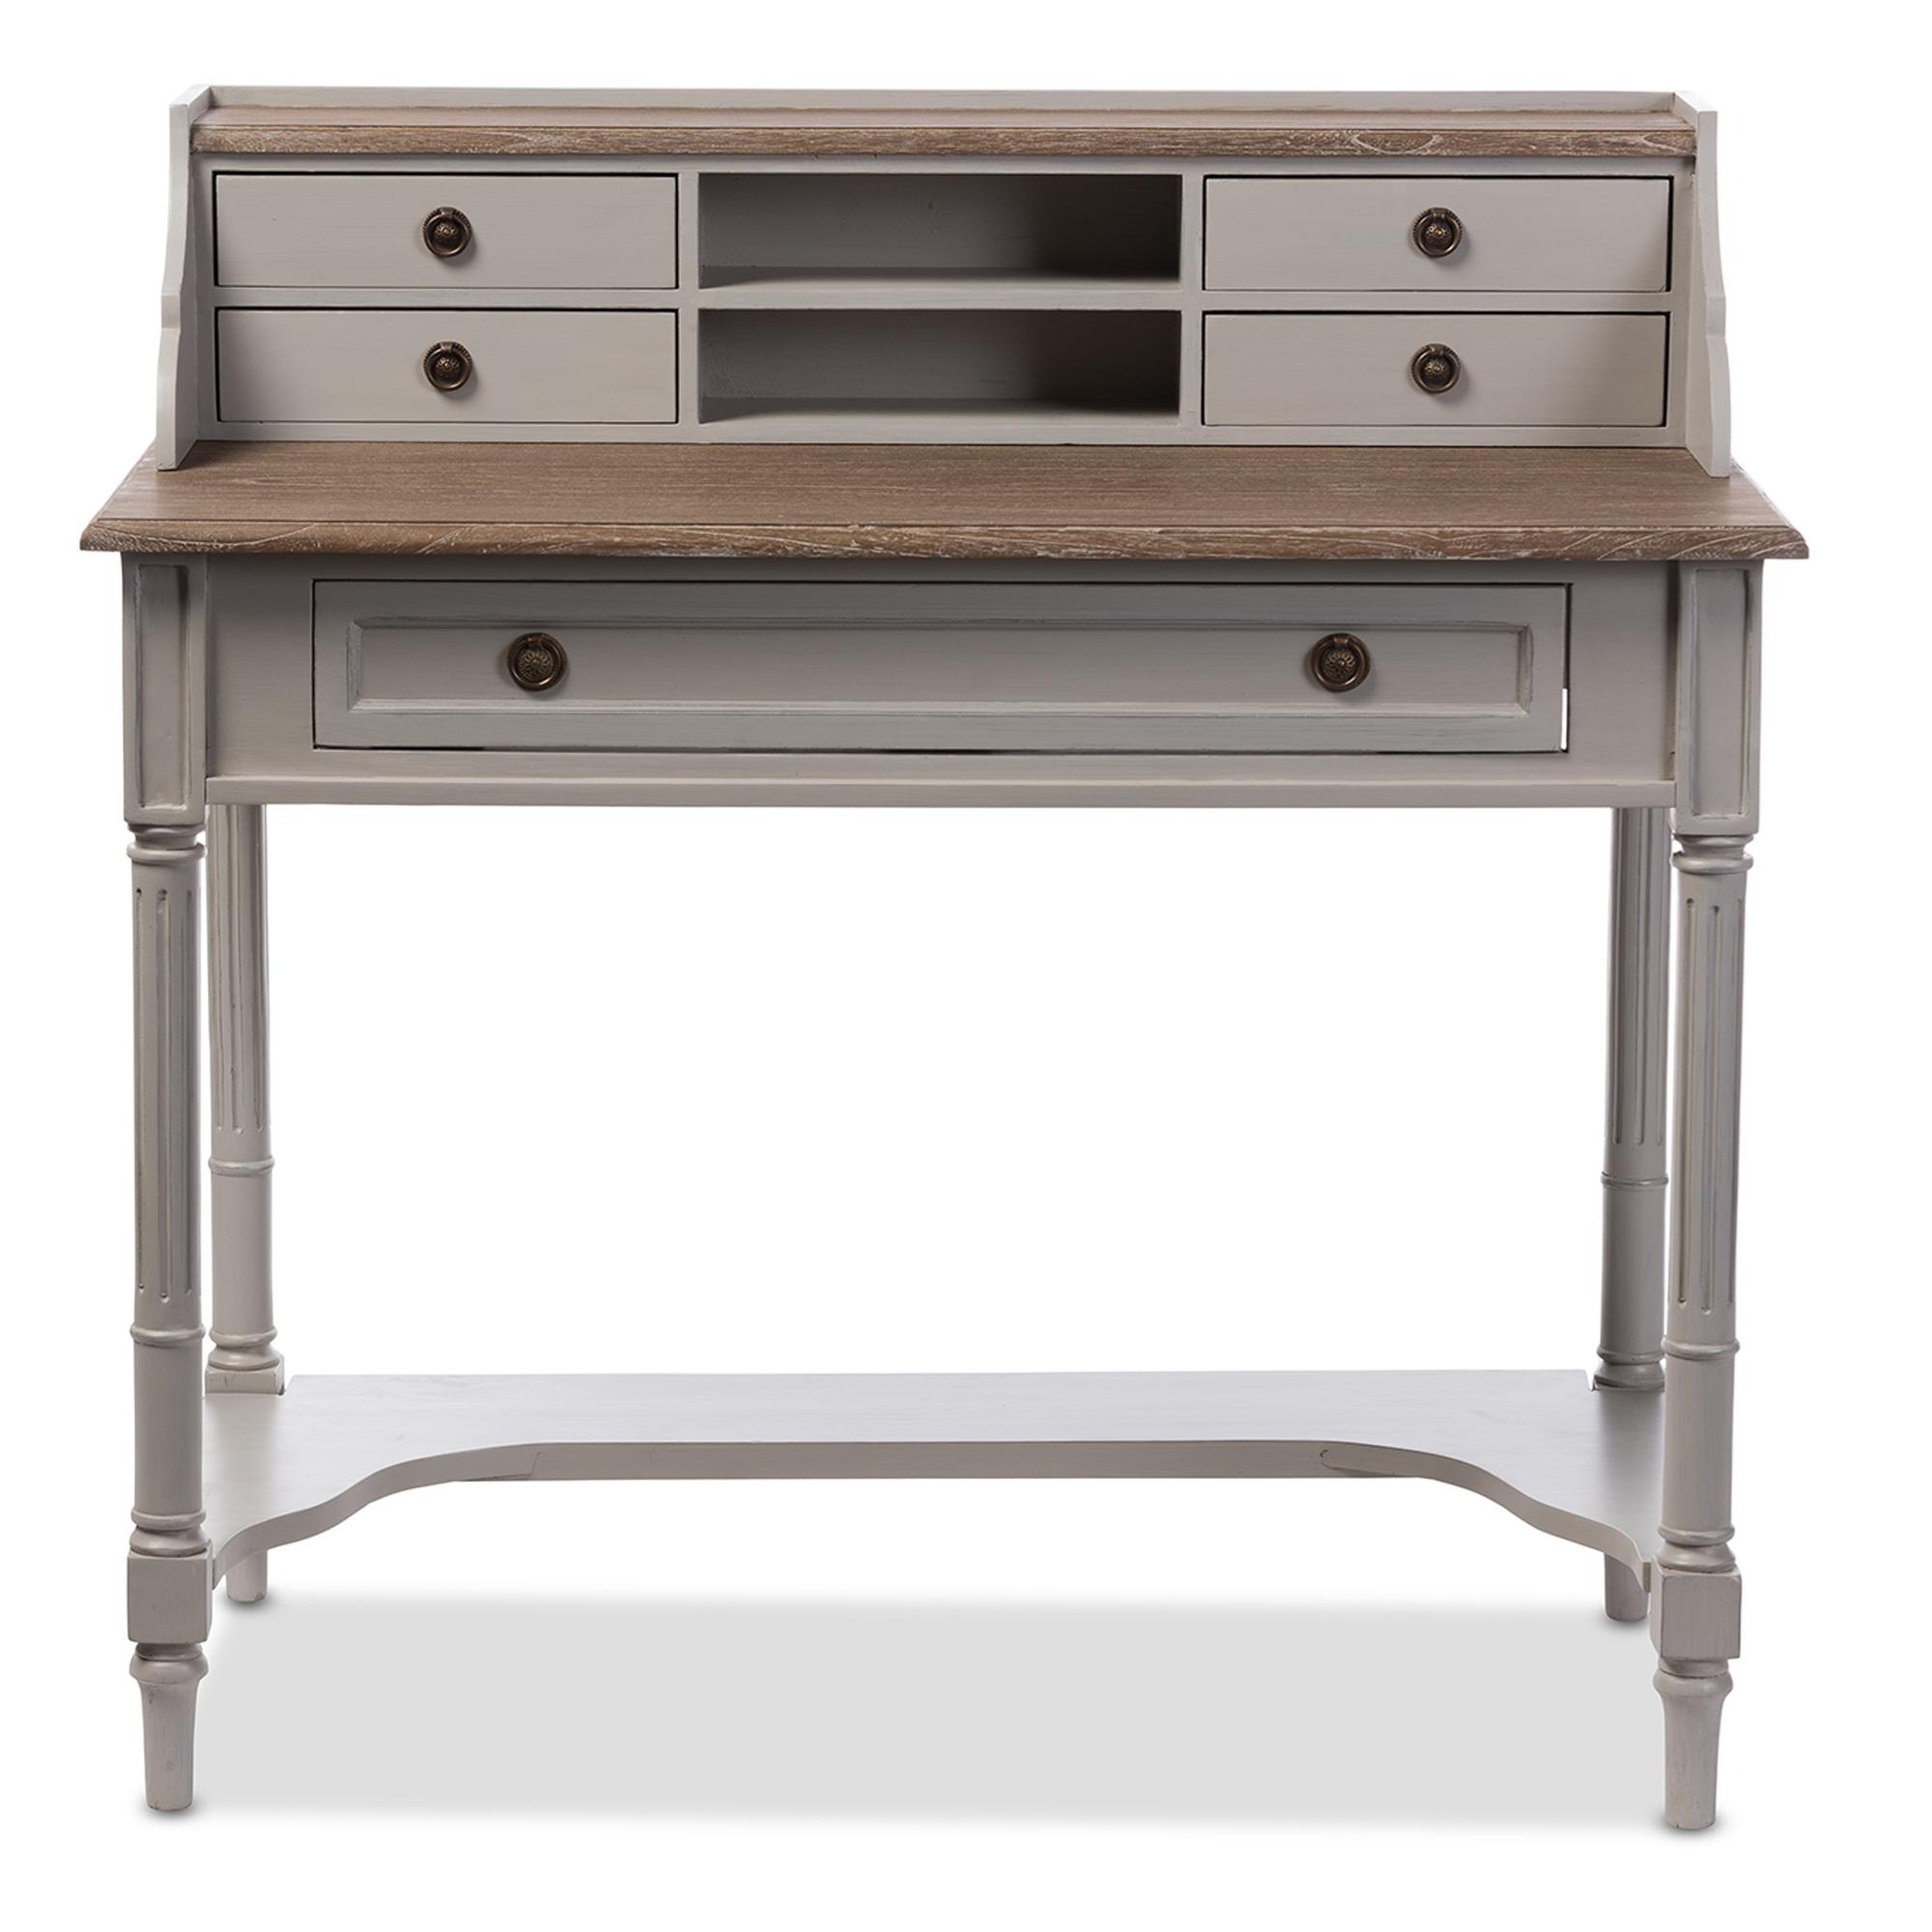 Baxton Studio   Wholesale Desks   Wholesale Home Office Furniture    Wholesale Furniture